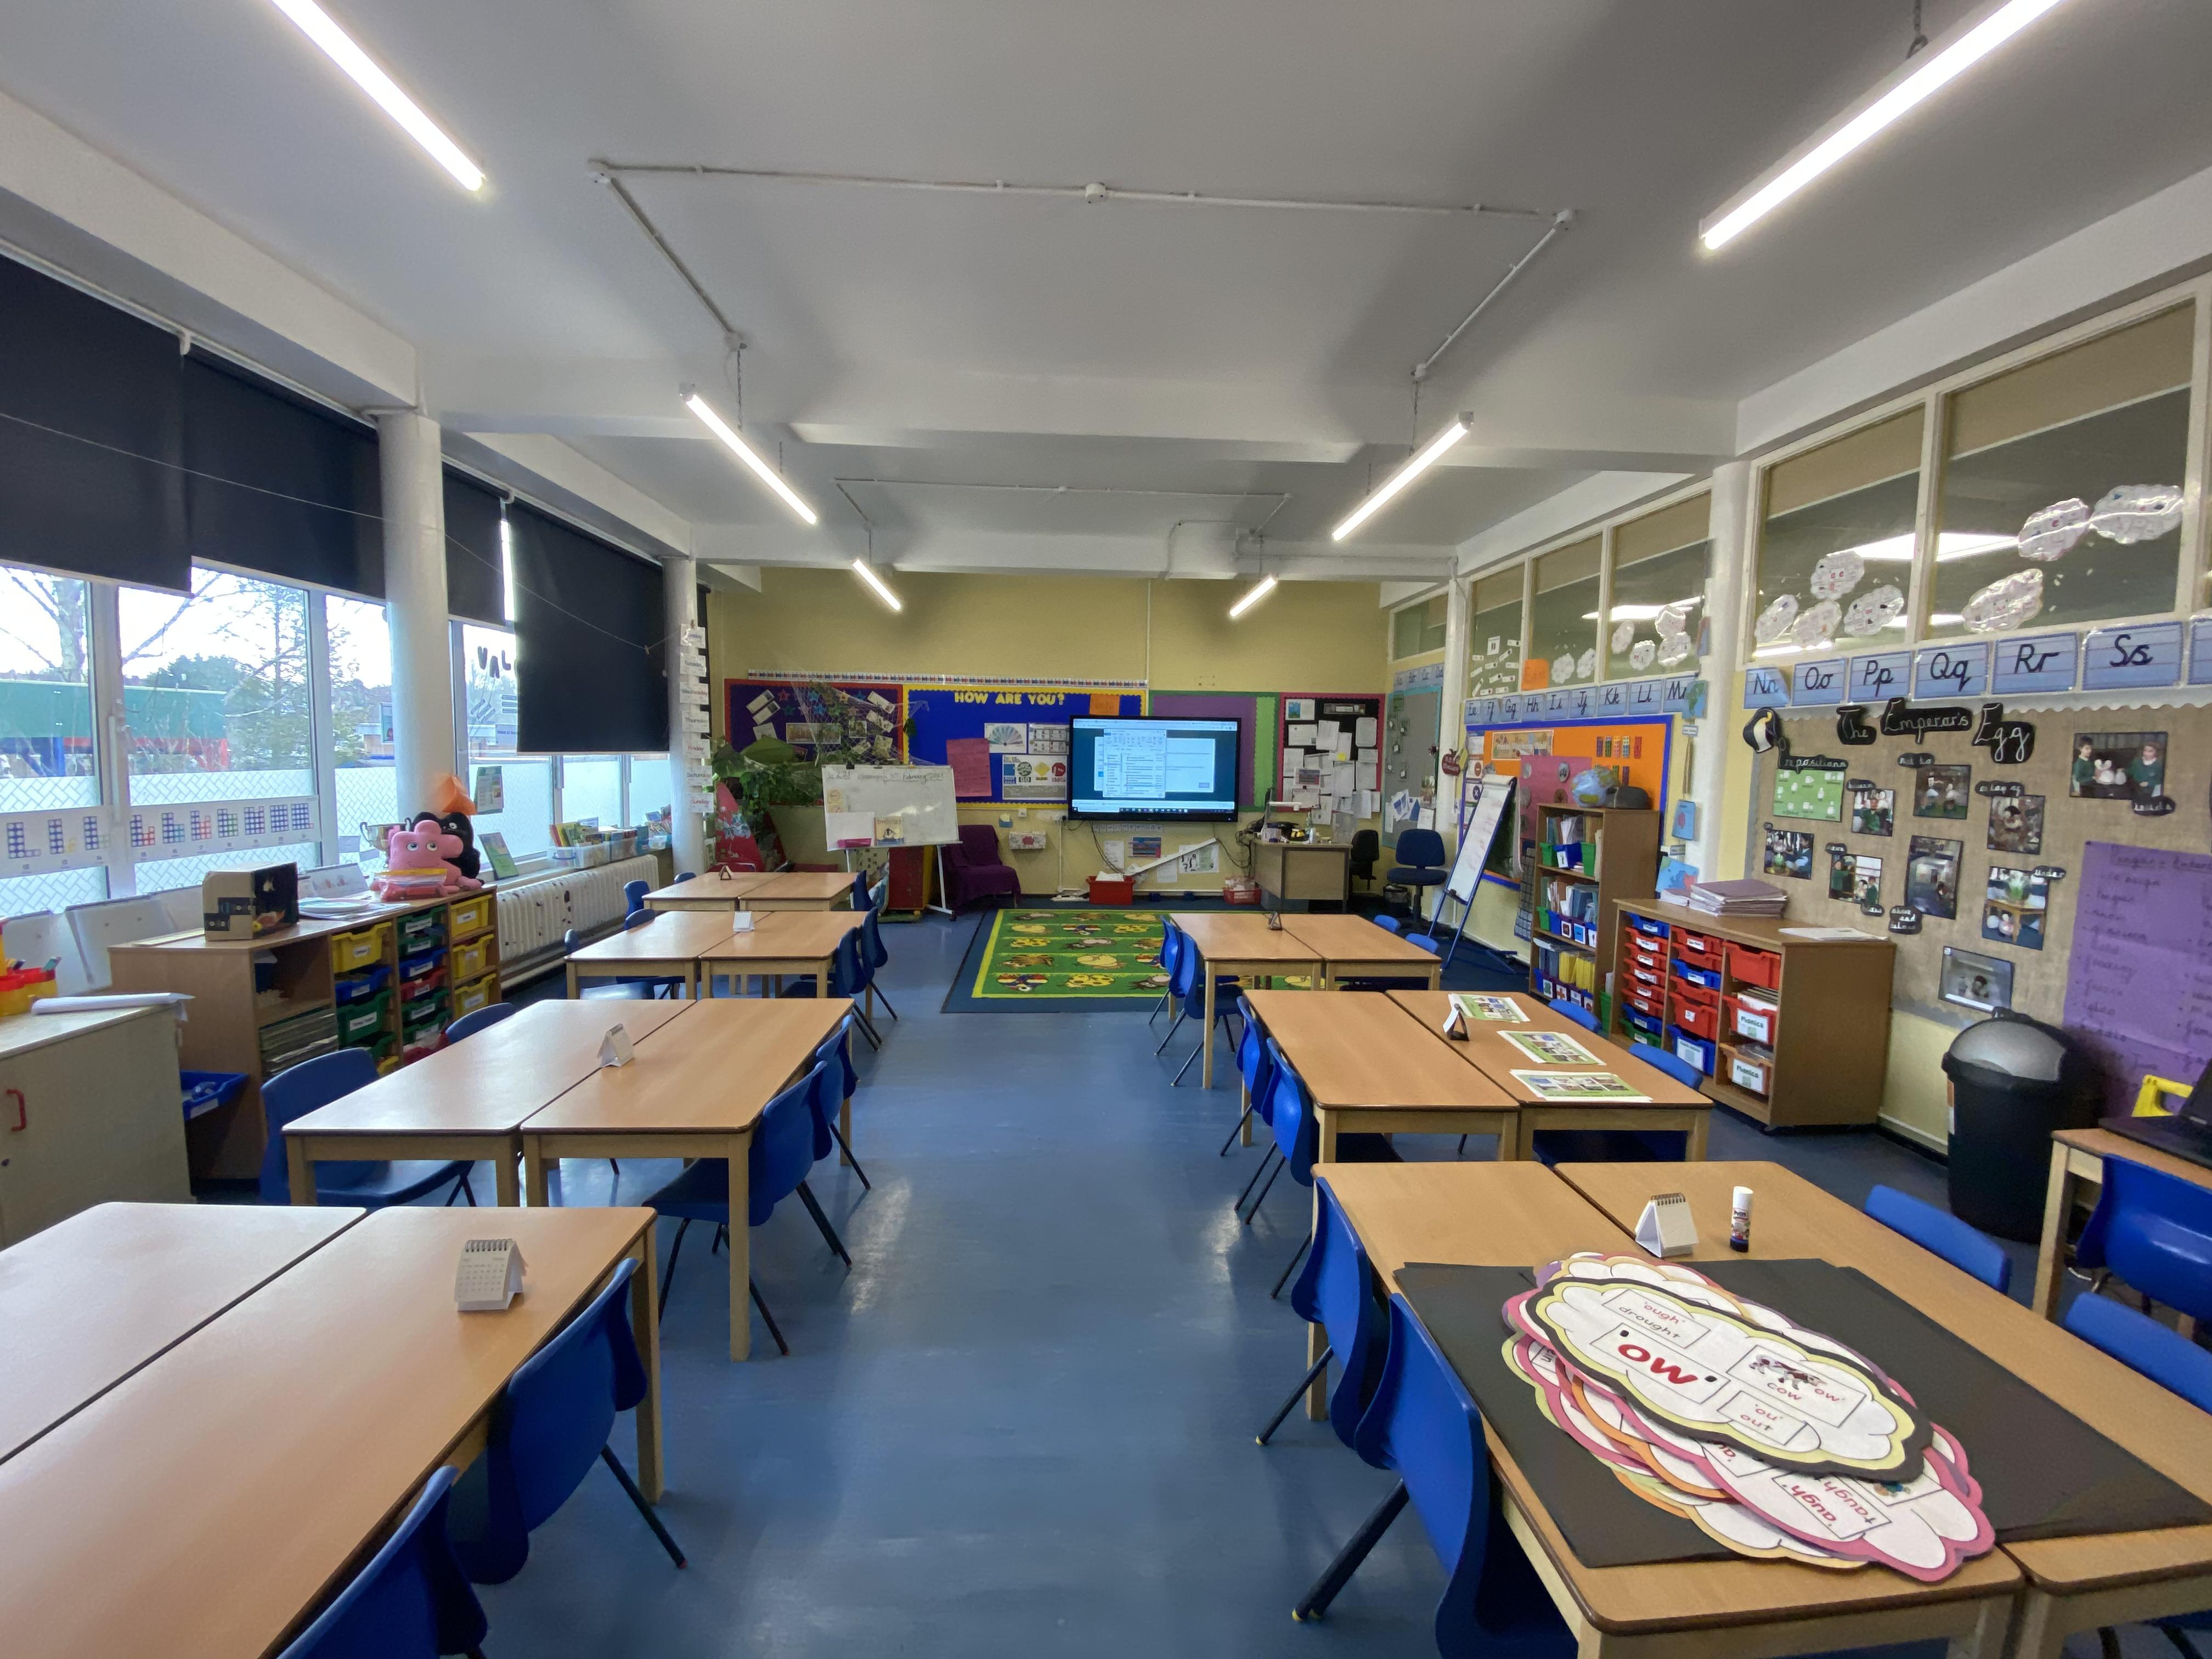 Coppetts Wood Classroom